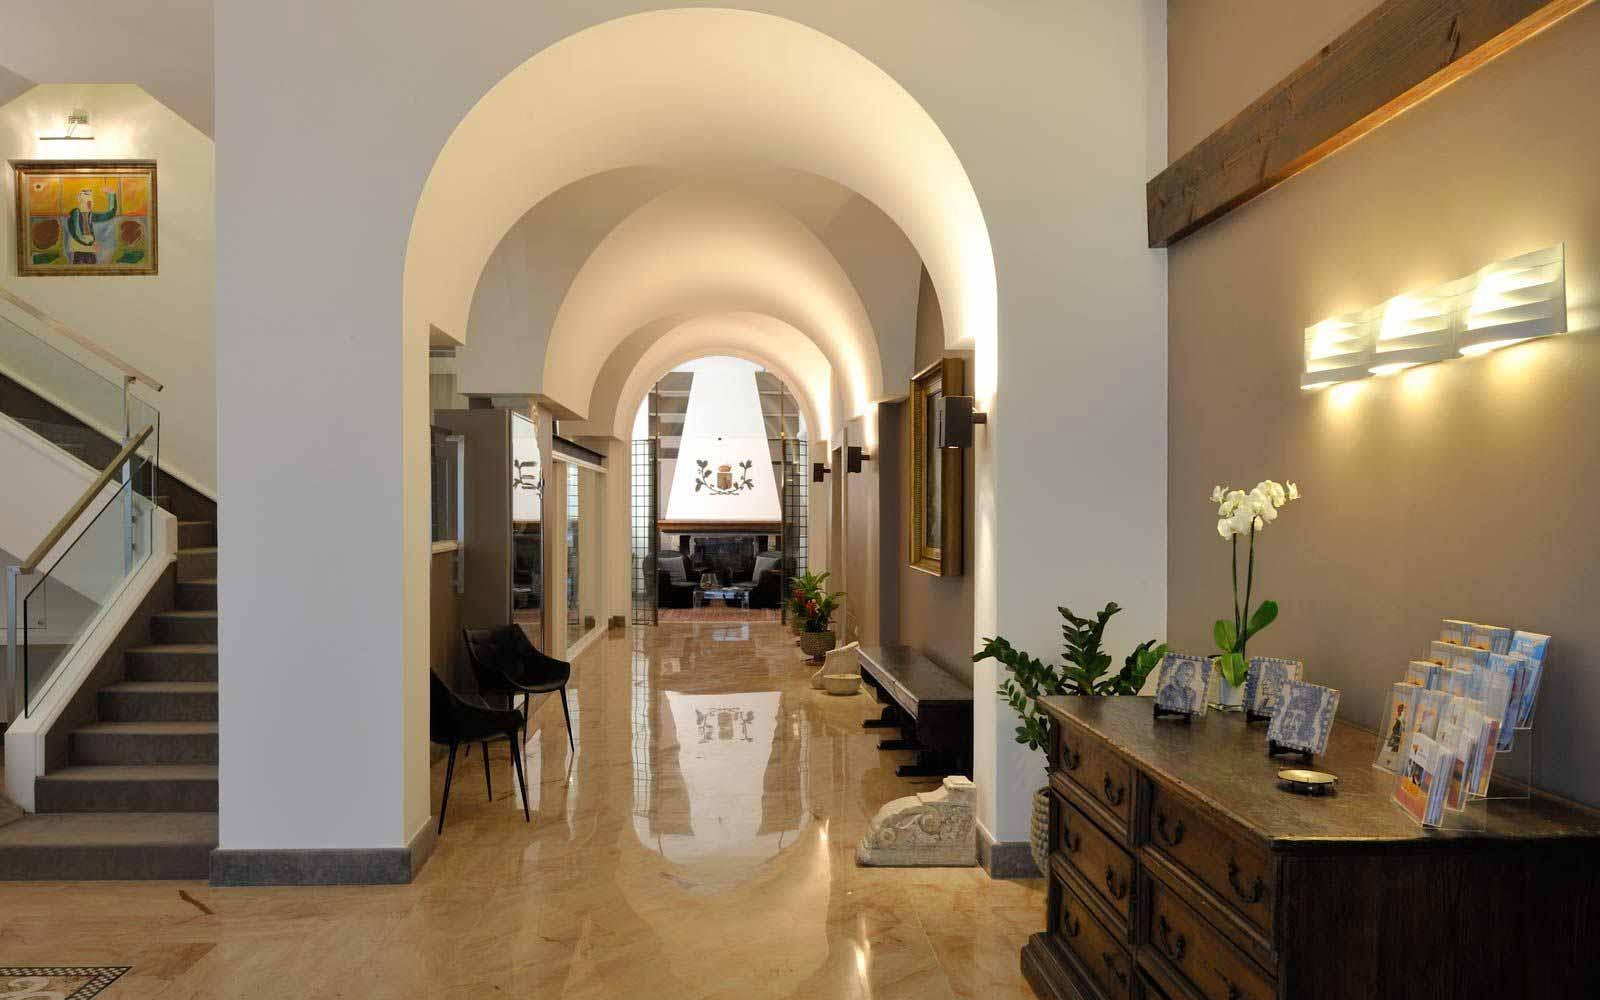 Reception hall at Hotel Principe Di Villafranca